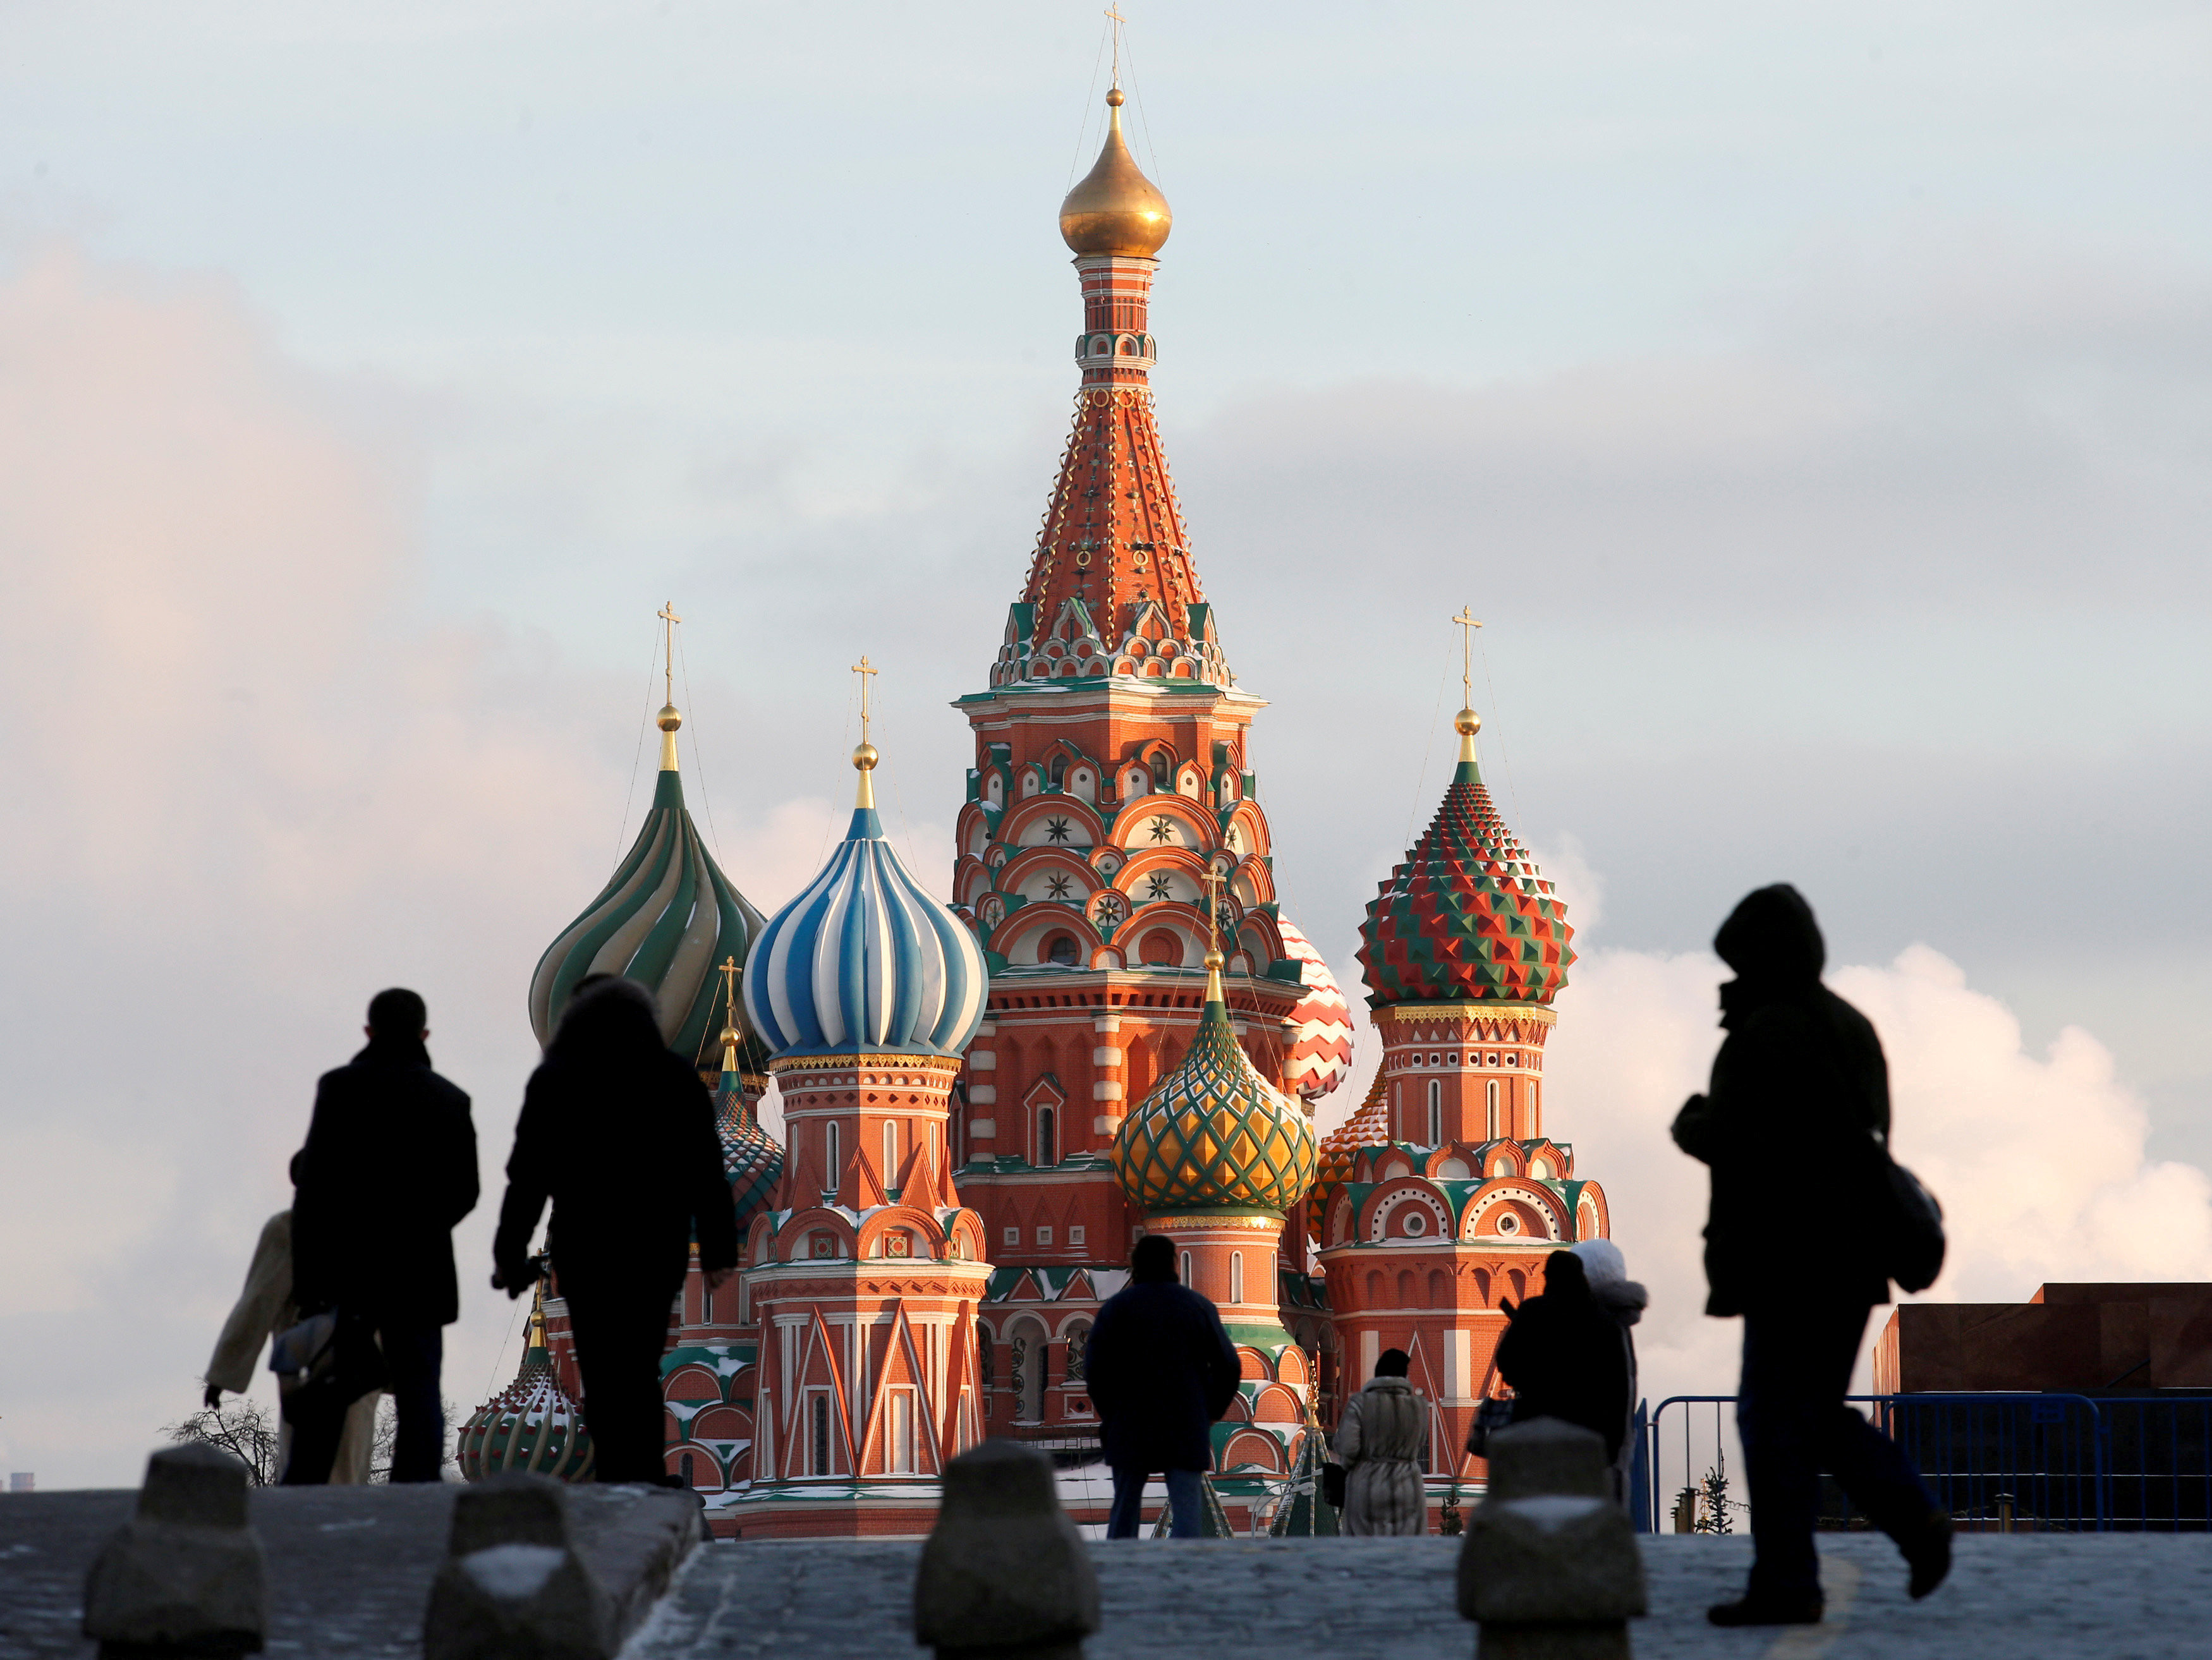 <p>Храм Василия Блаженного. Фото: &copy; REUTERS/Maxim Zmeyev</p>